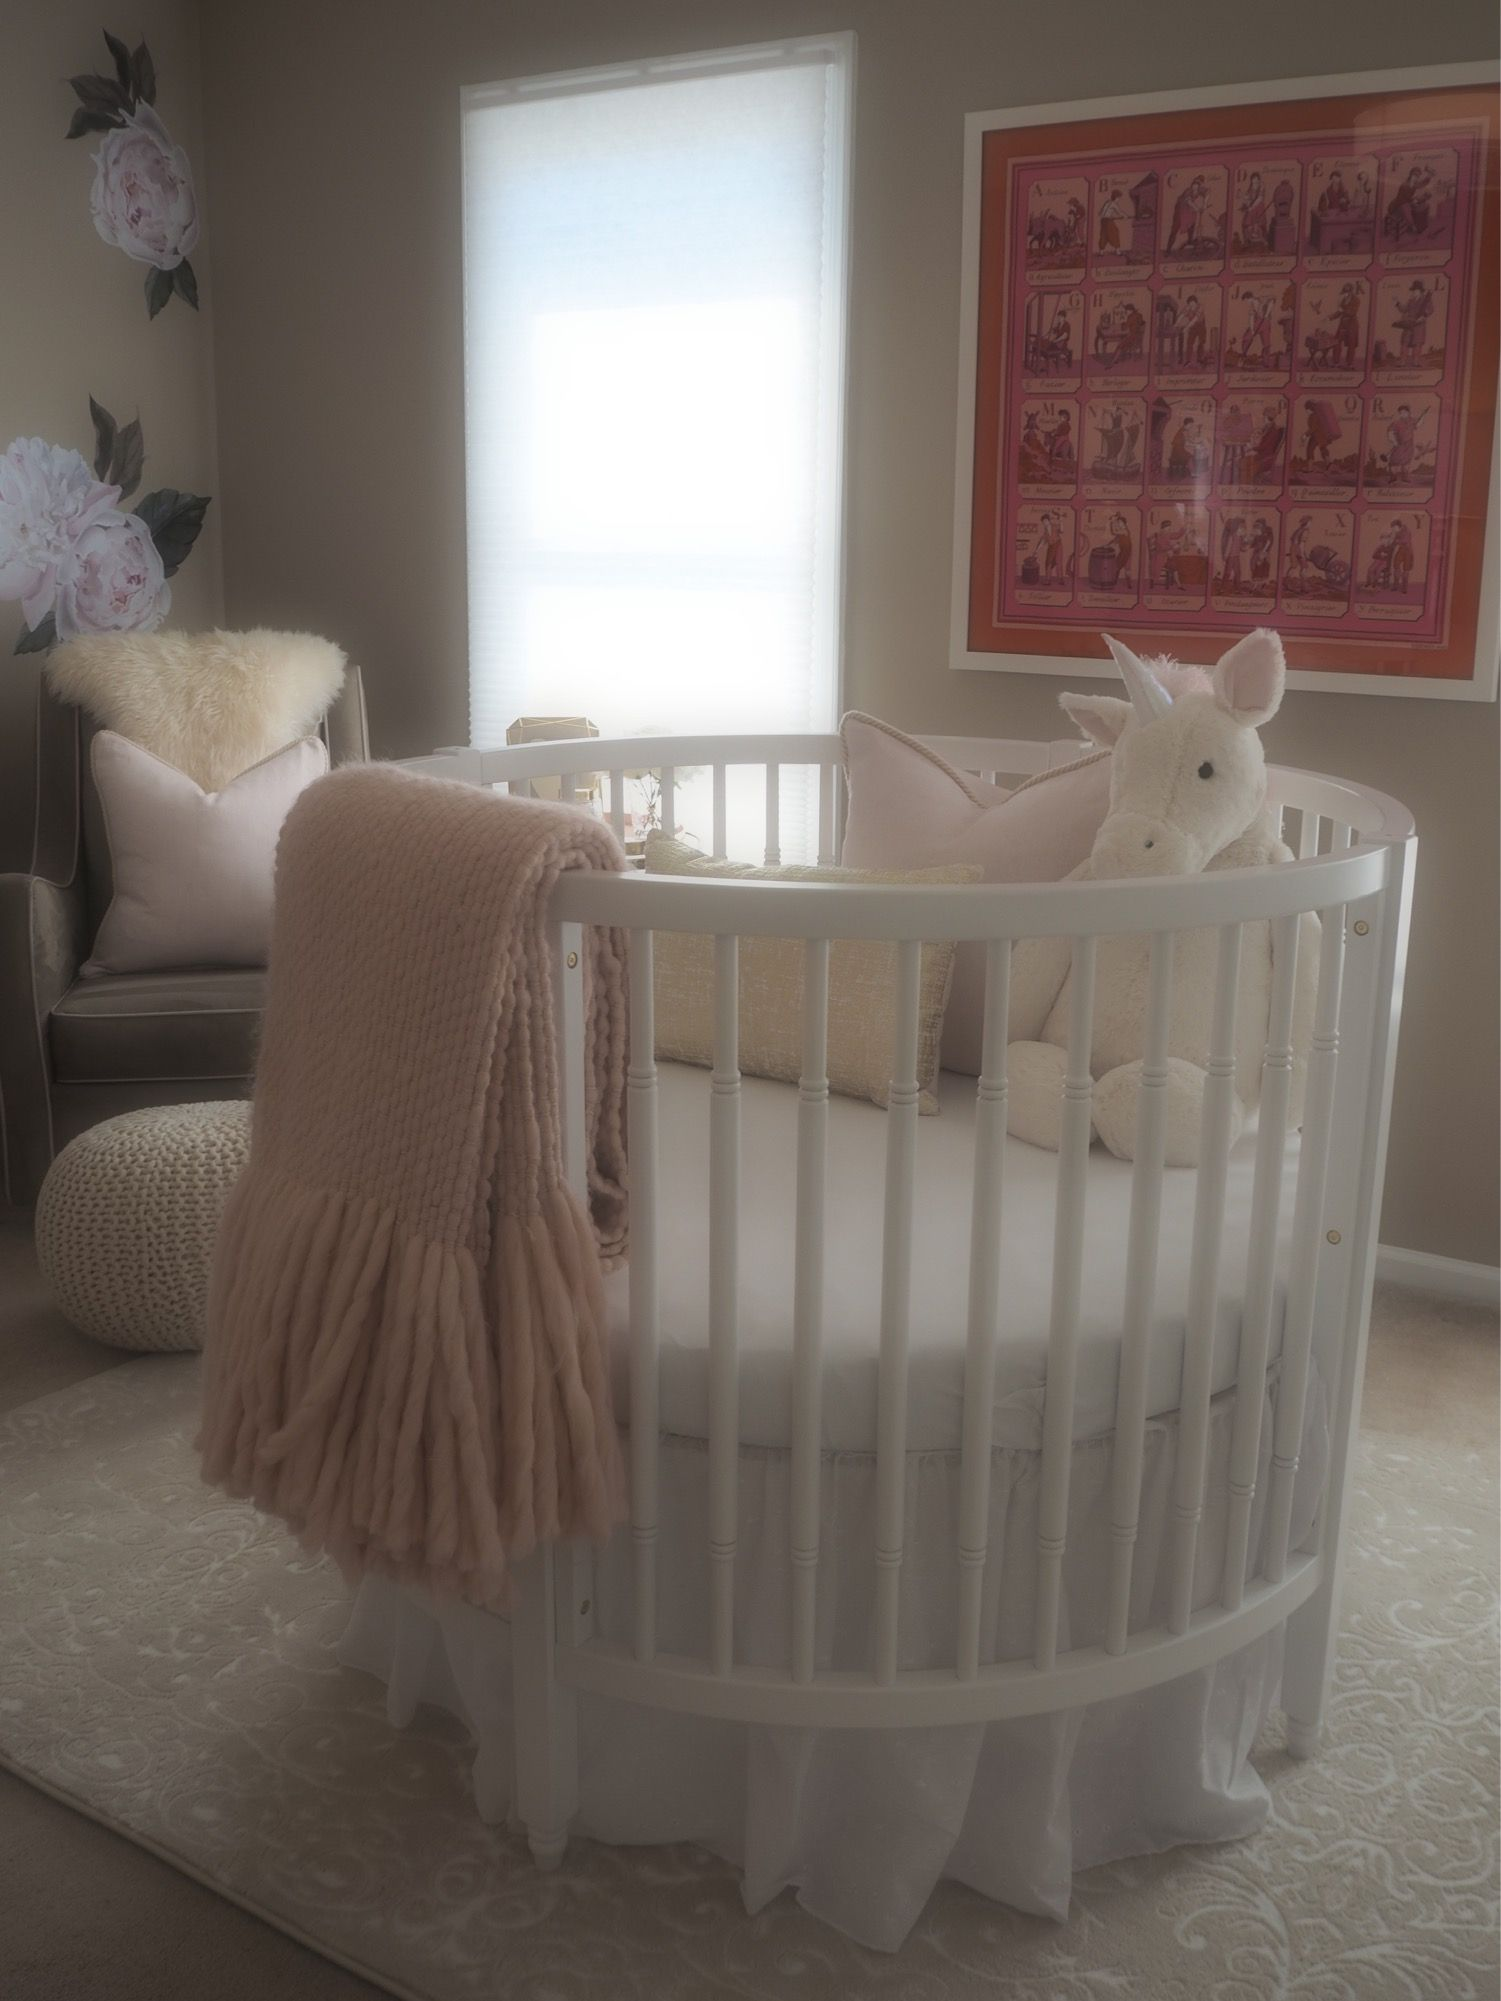 Blush Plush Baby Love Project Nursery Round Baby Cribs Best Baby Cribs Round Cribs